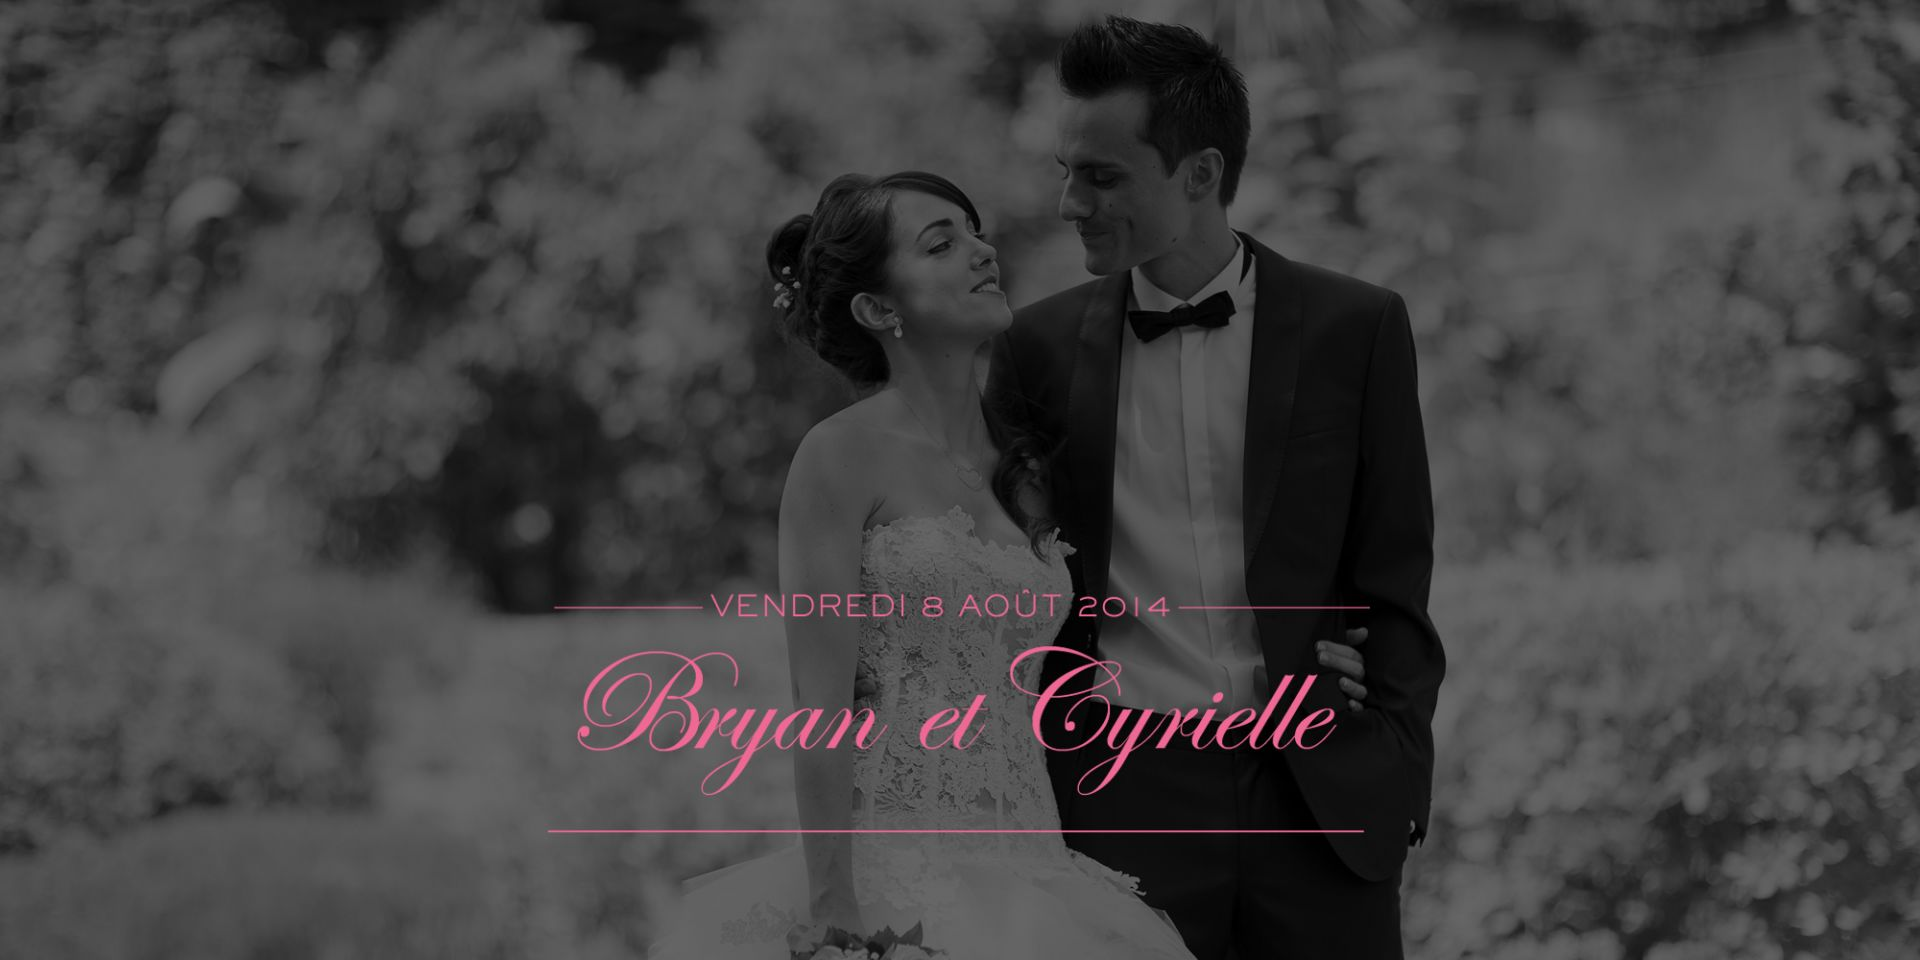 Bryan et Cyrielle